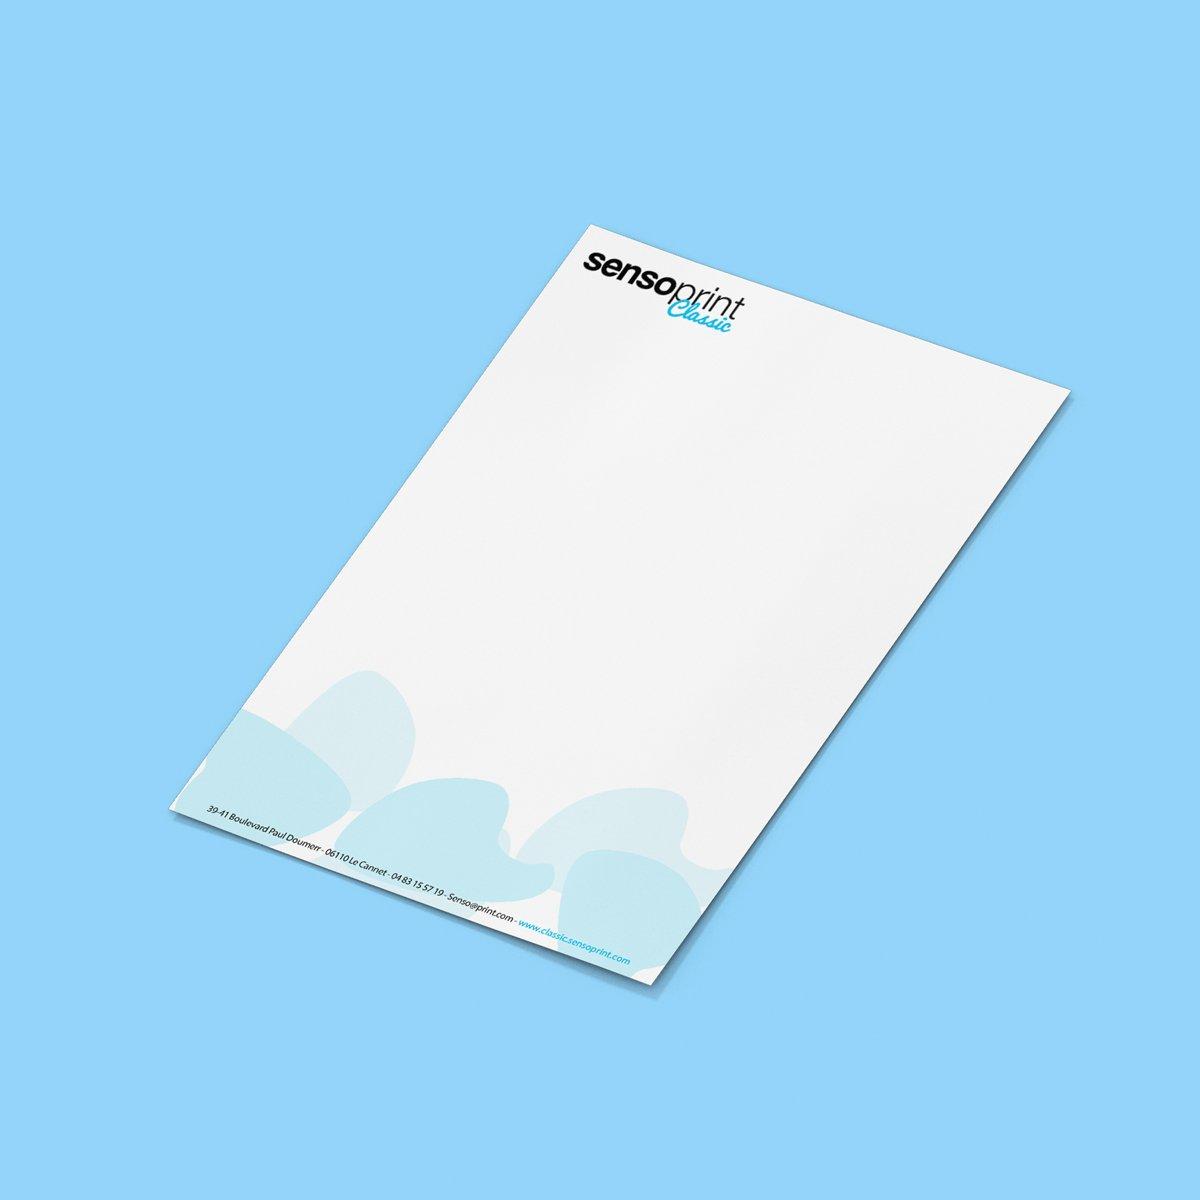 https://www.sensoprint.frcarte de correspondance personnalisée